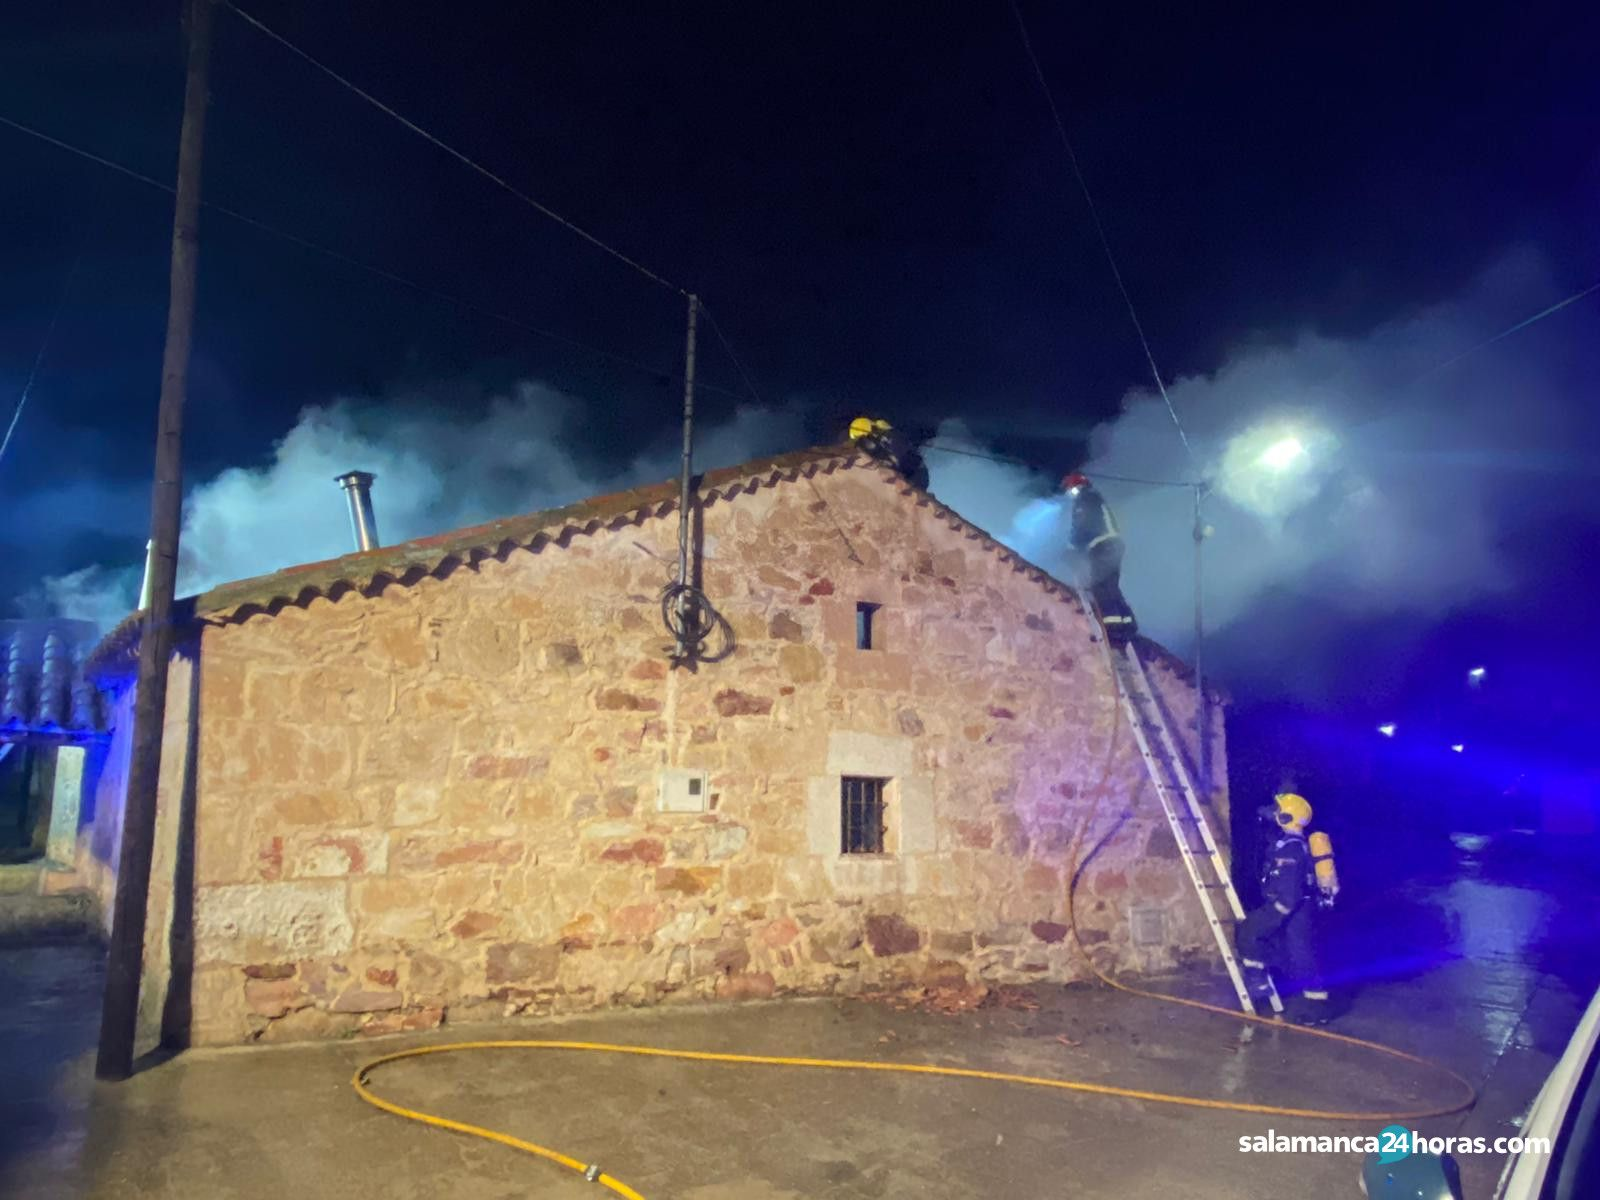 Incendio calle de la huertaWhatsApp Image 2020 10 21 at 07.54.52